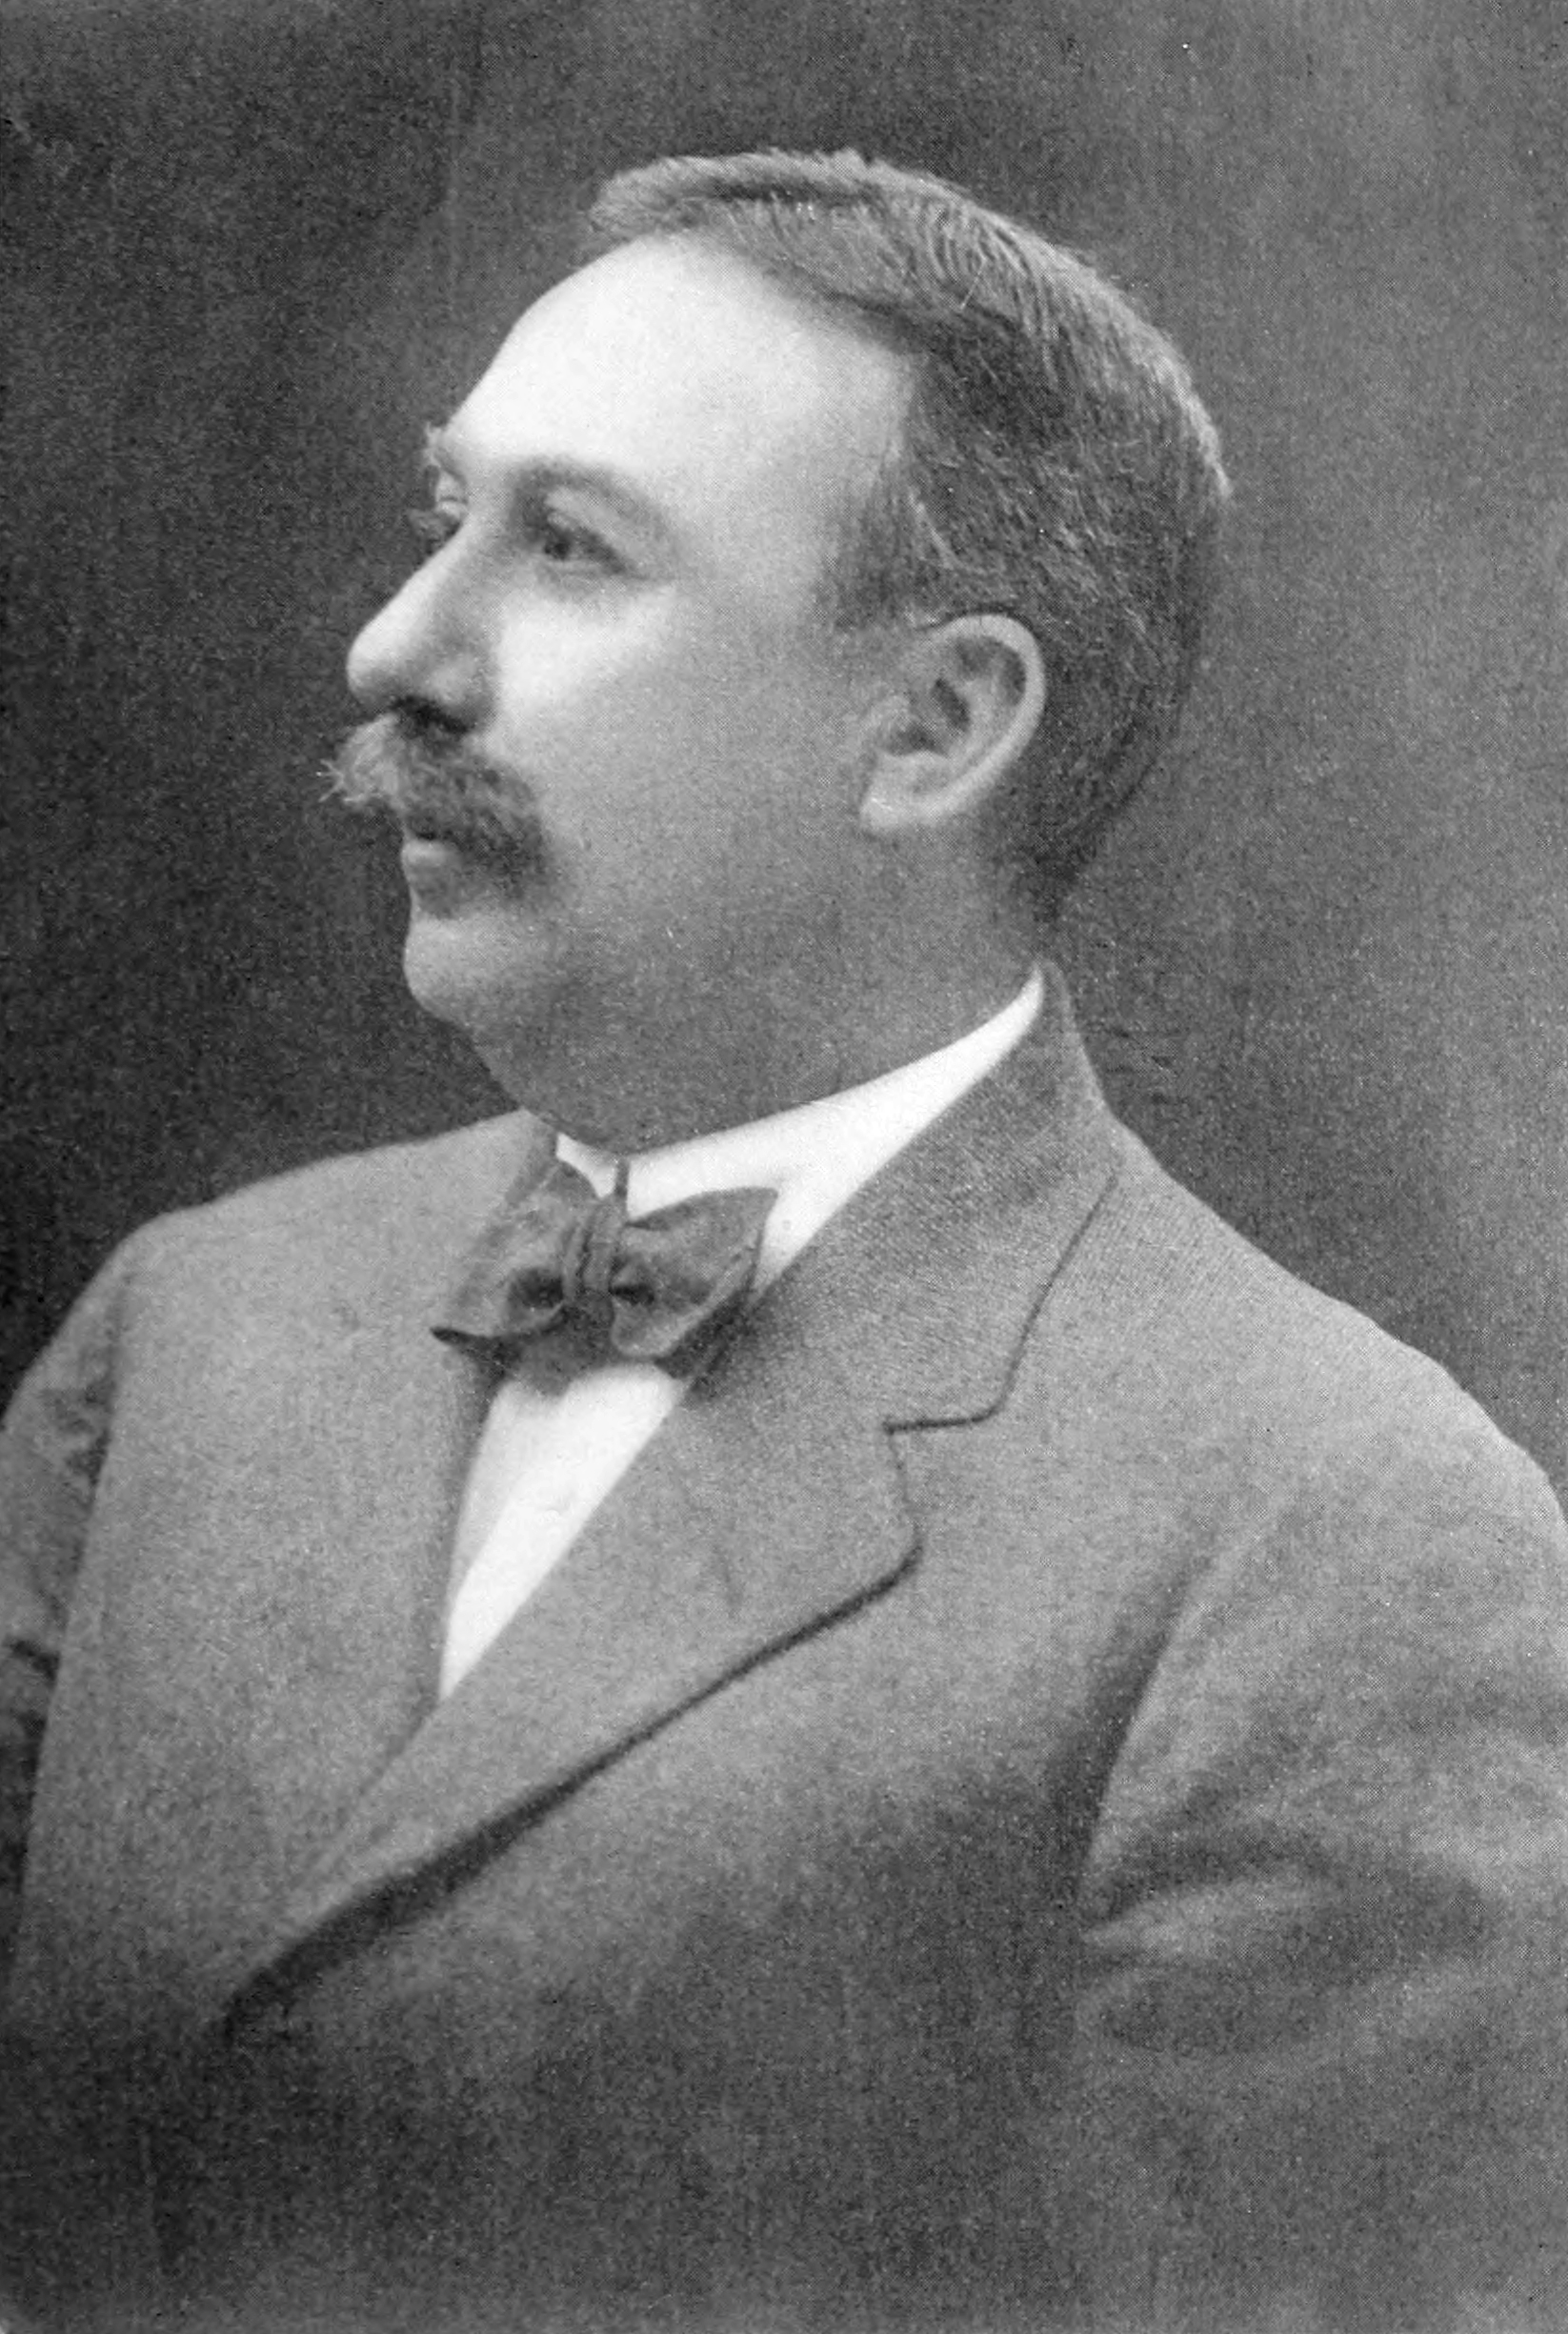 Edwin stanton porter wikidata - Porter international wiki ...